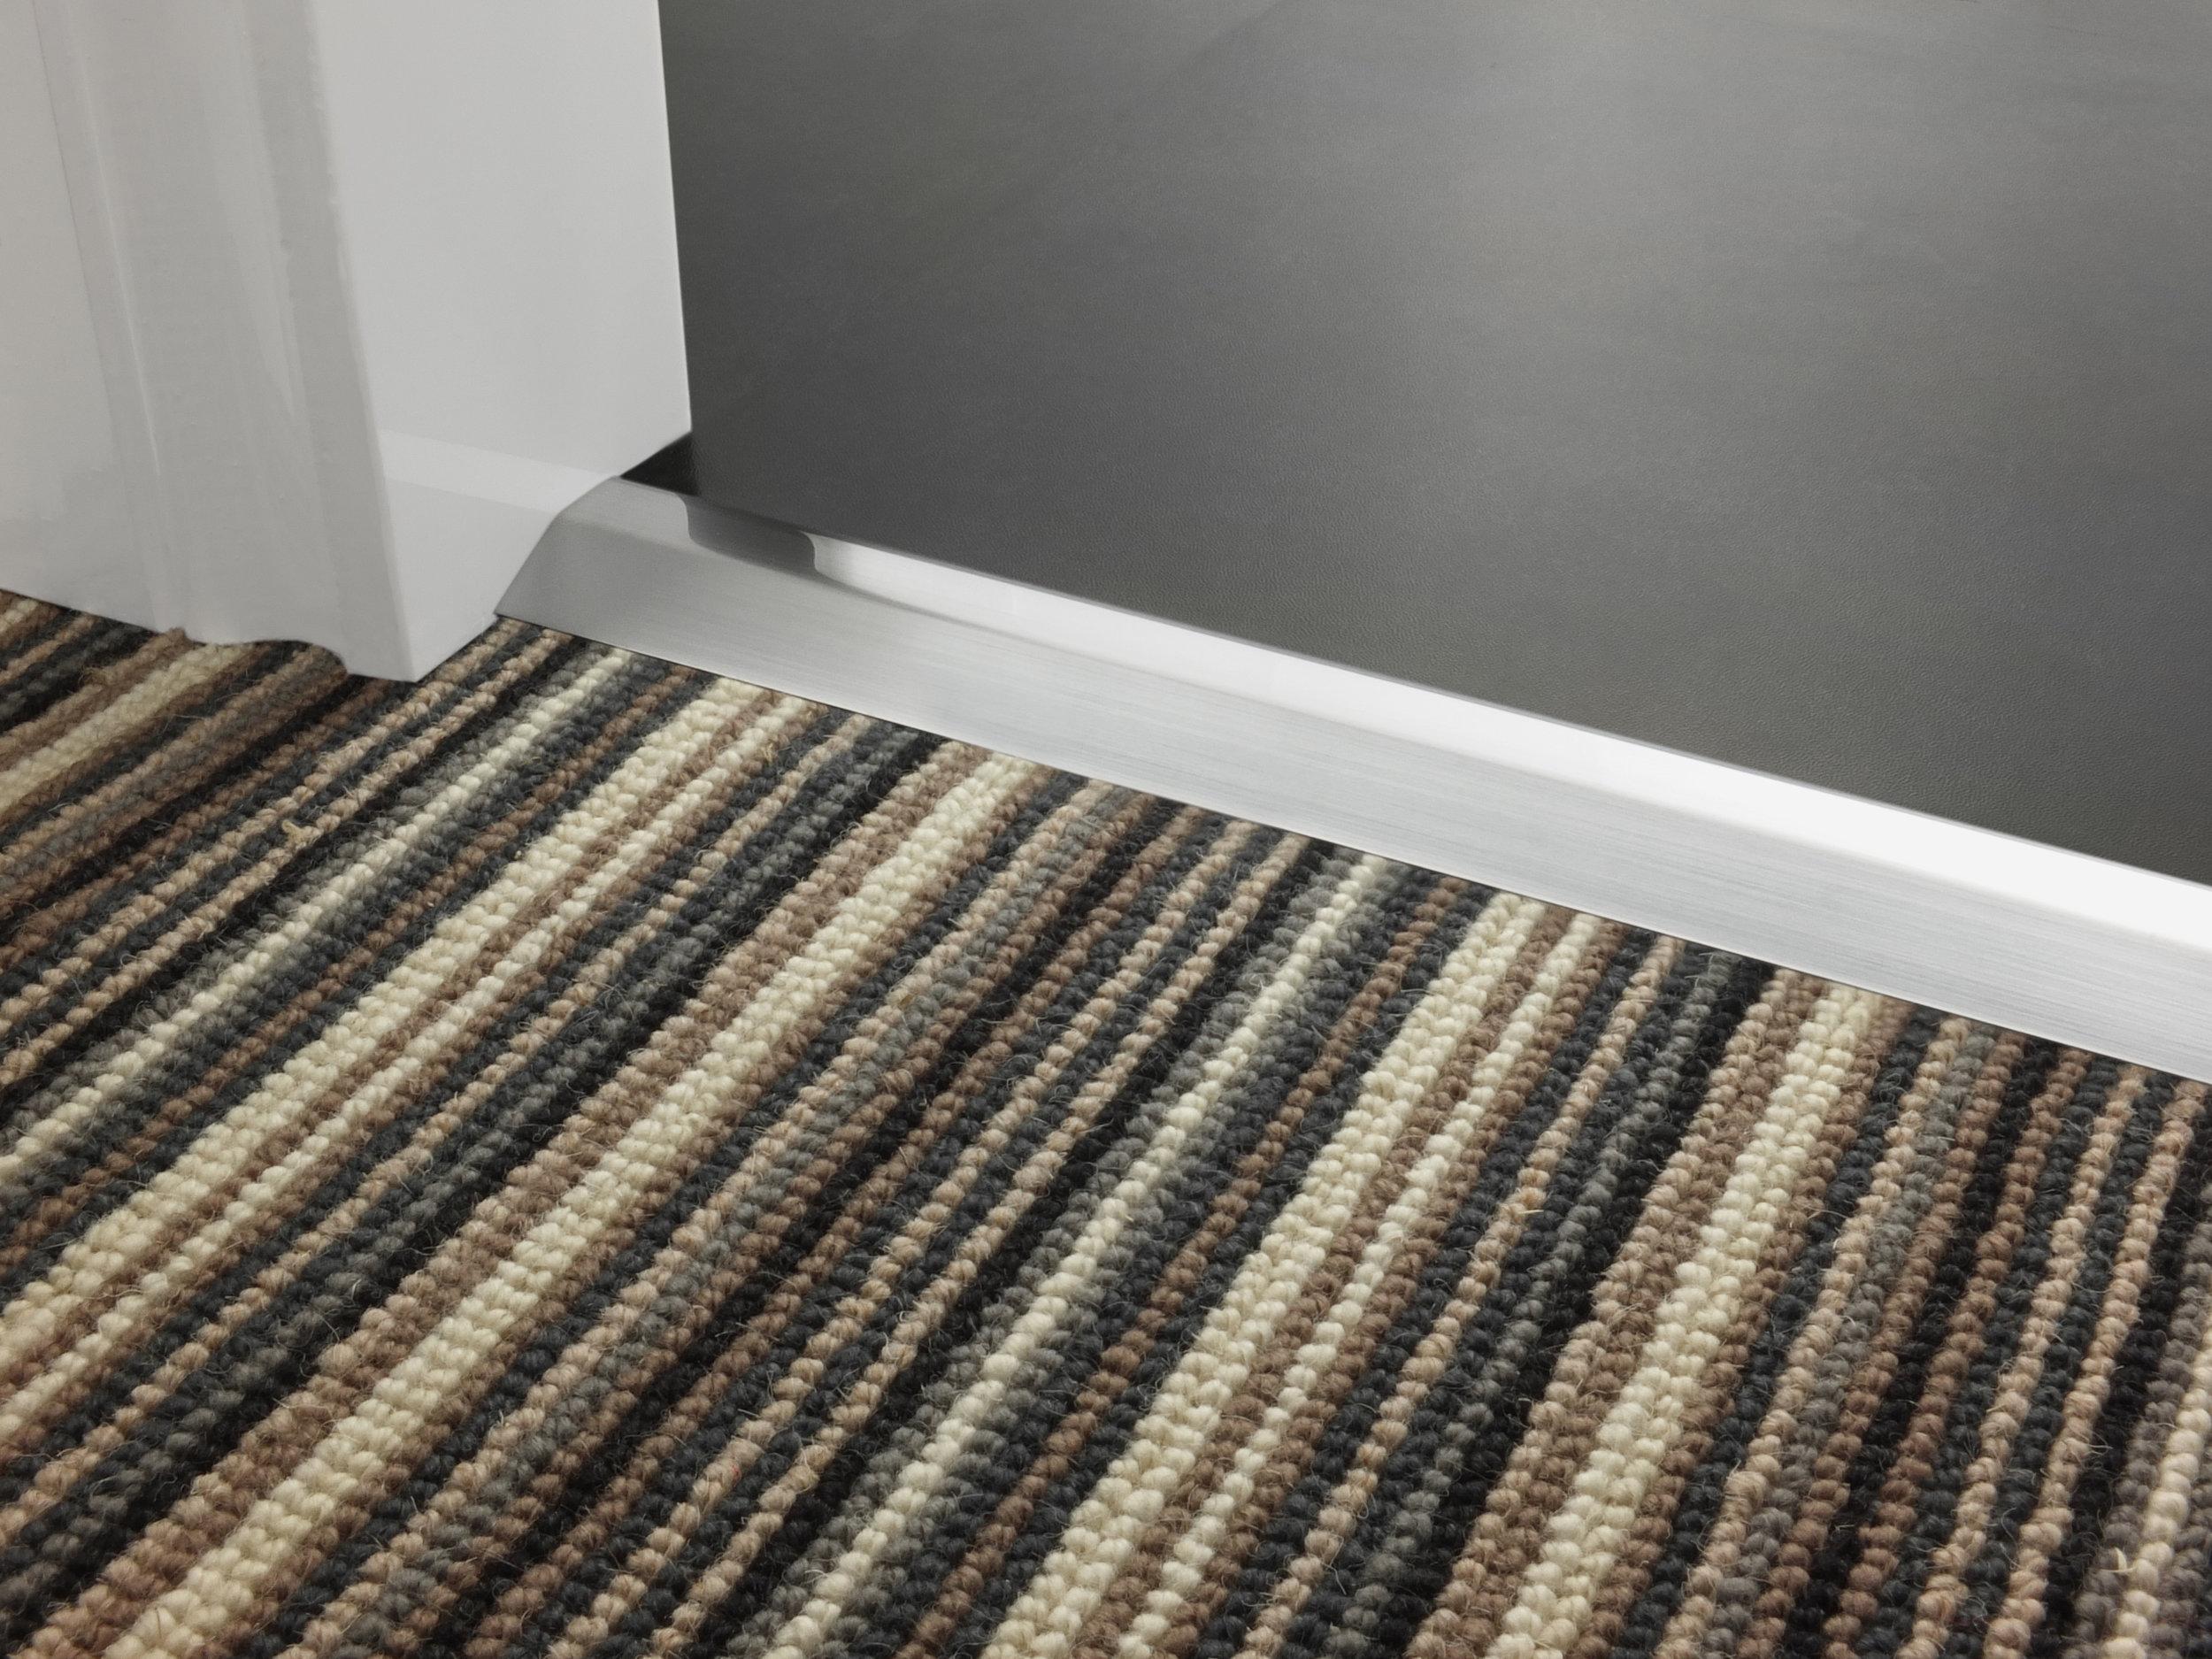 stairrods-doorbar-brushed-chrome-compression-ramp-8mm-HHF.jpg